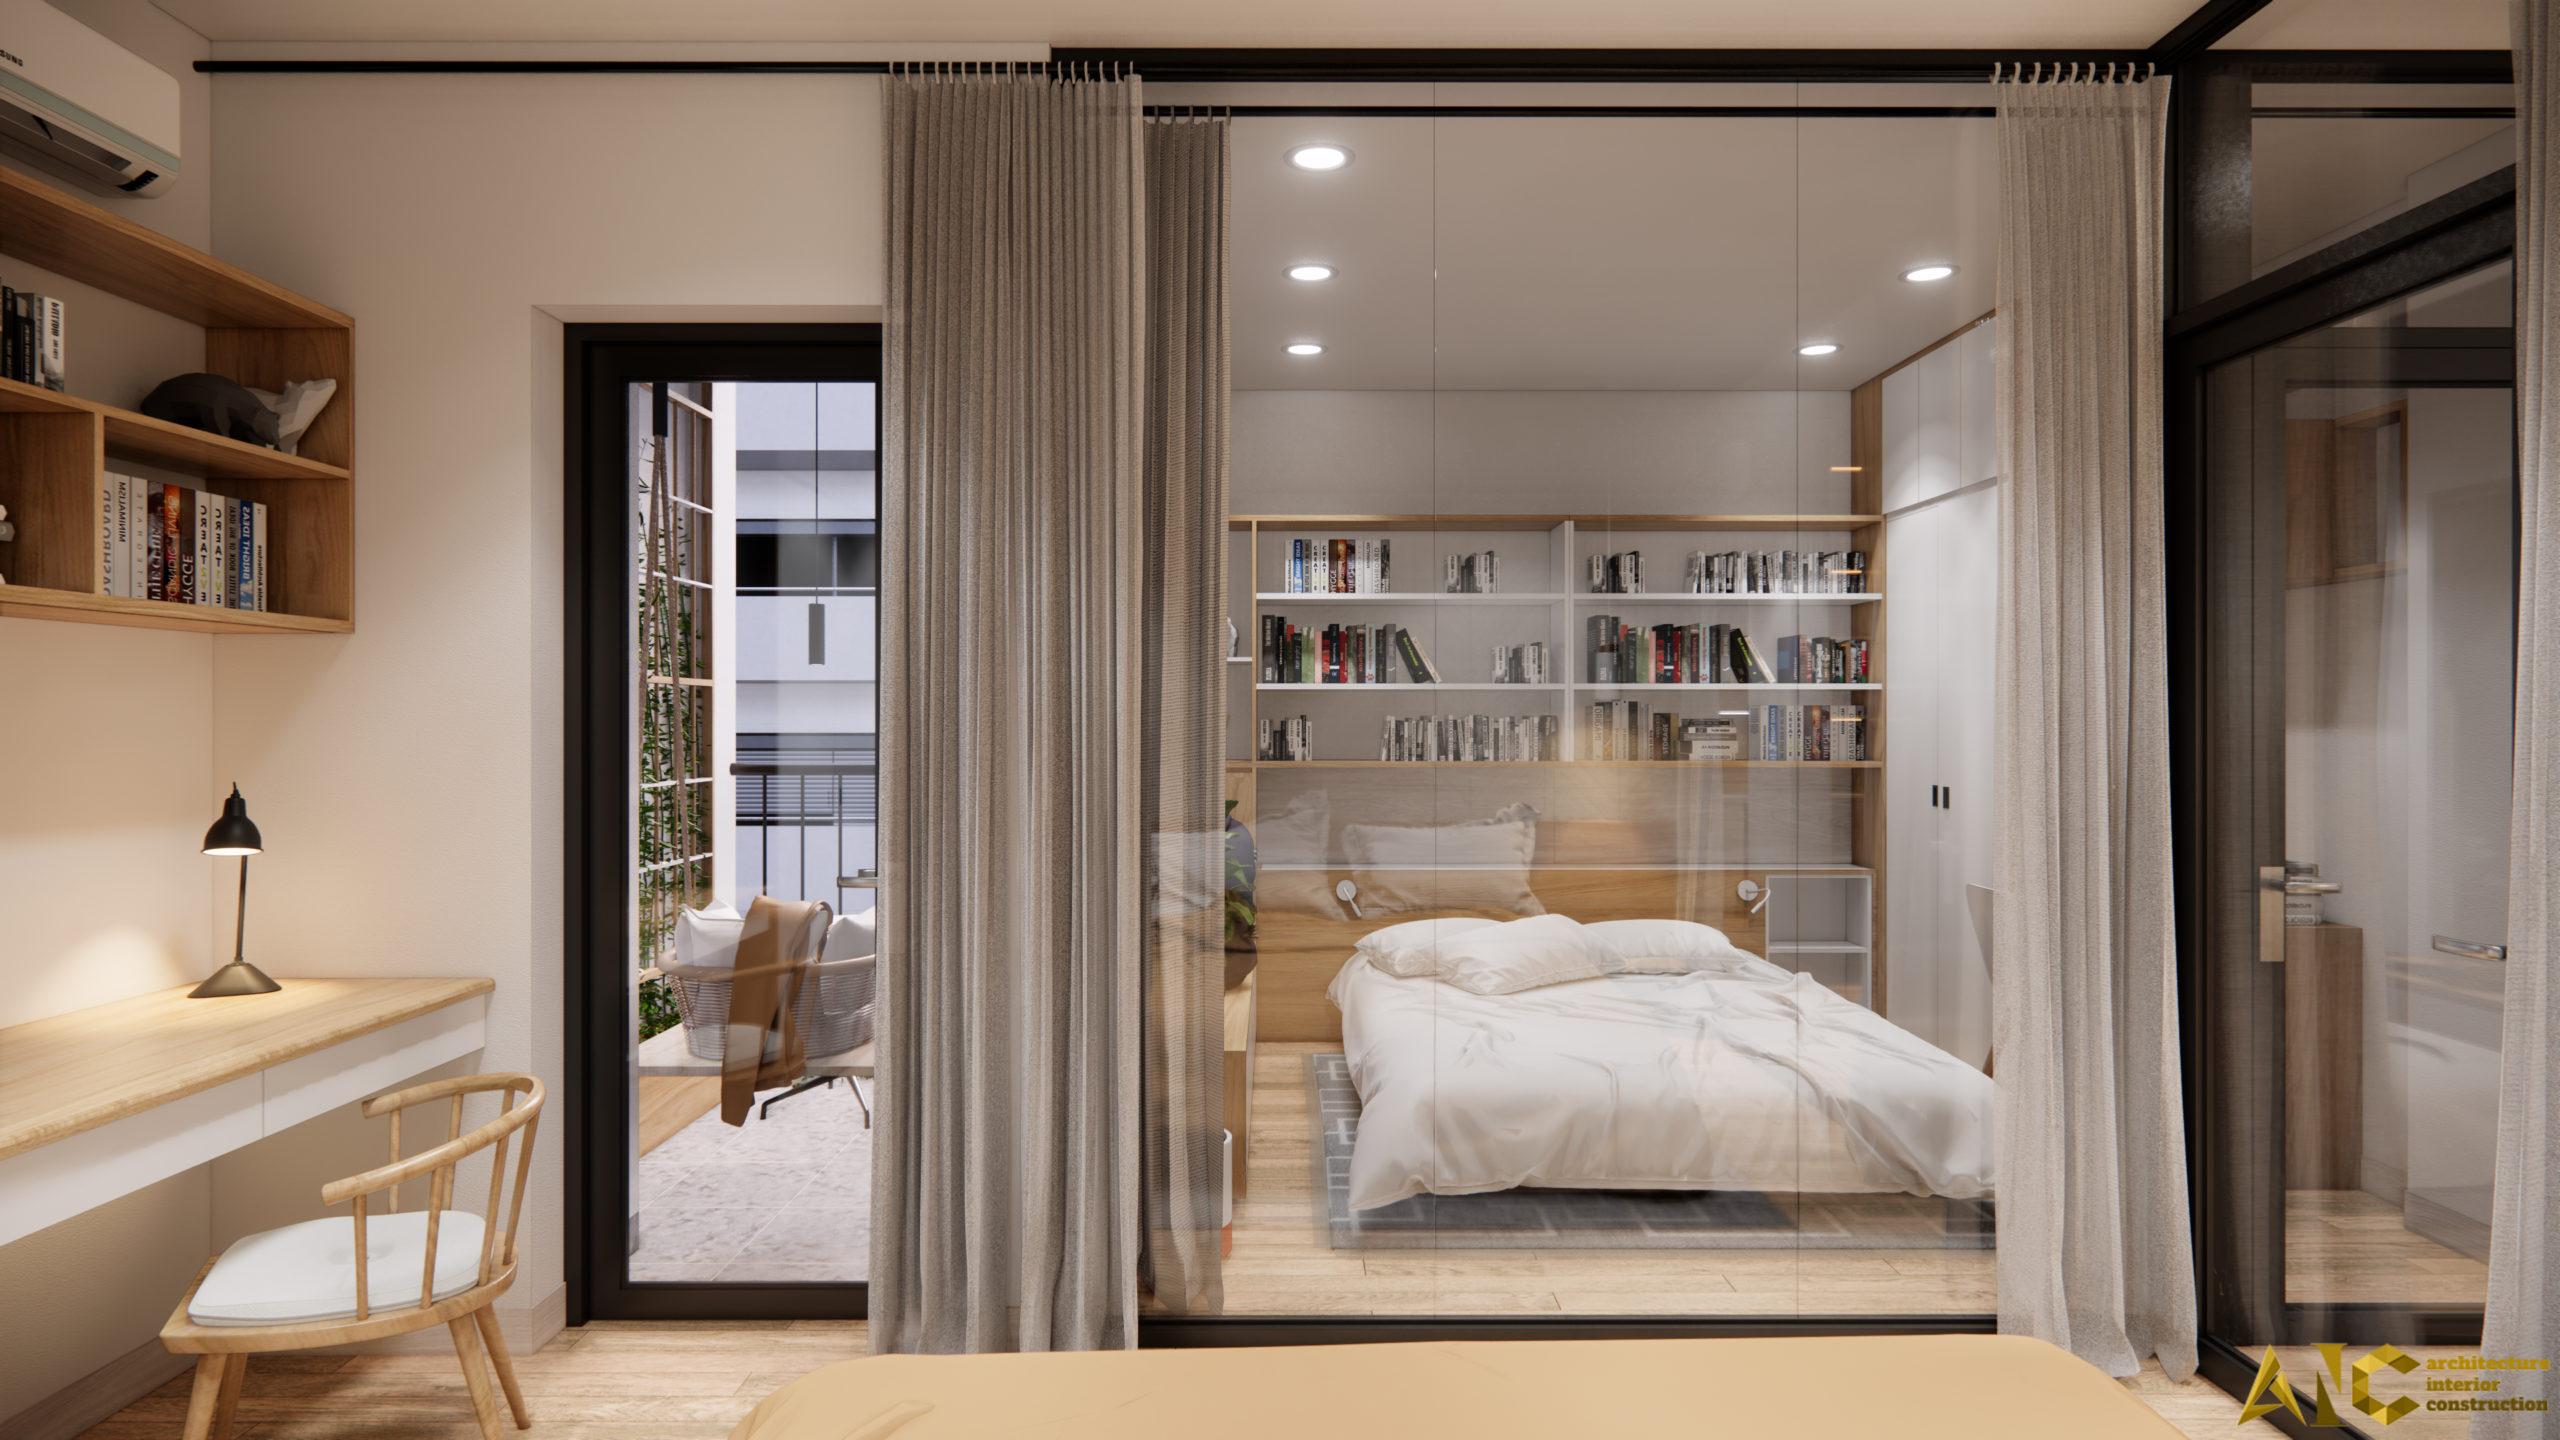 thiết kế căn hộ him lam (25)